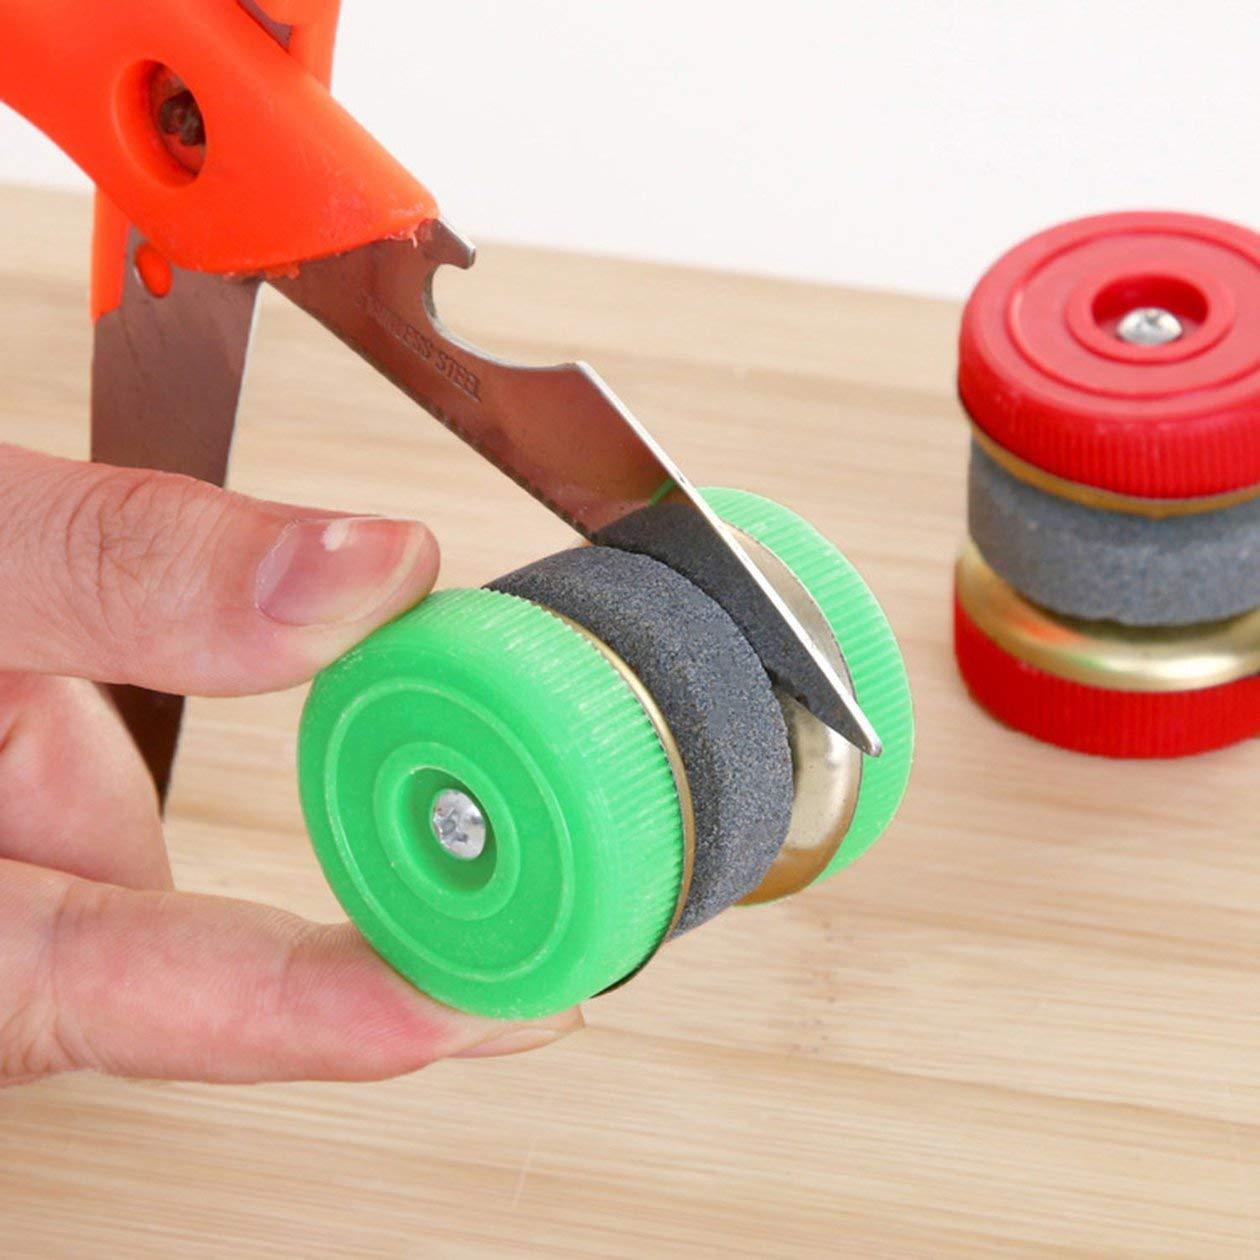 BIYI Mini affilacoltelli Mole tonde per affilare Pietra per affilare Utensili da Cucina Accessori per Utensili da Cucina Casuali